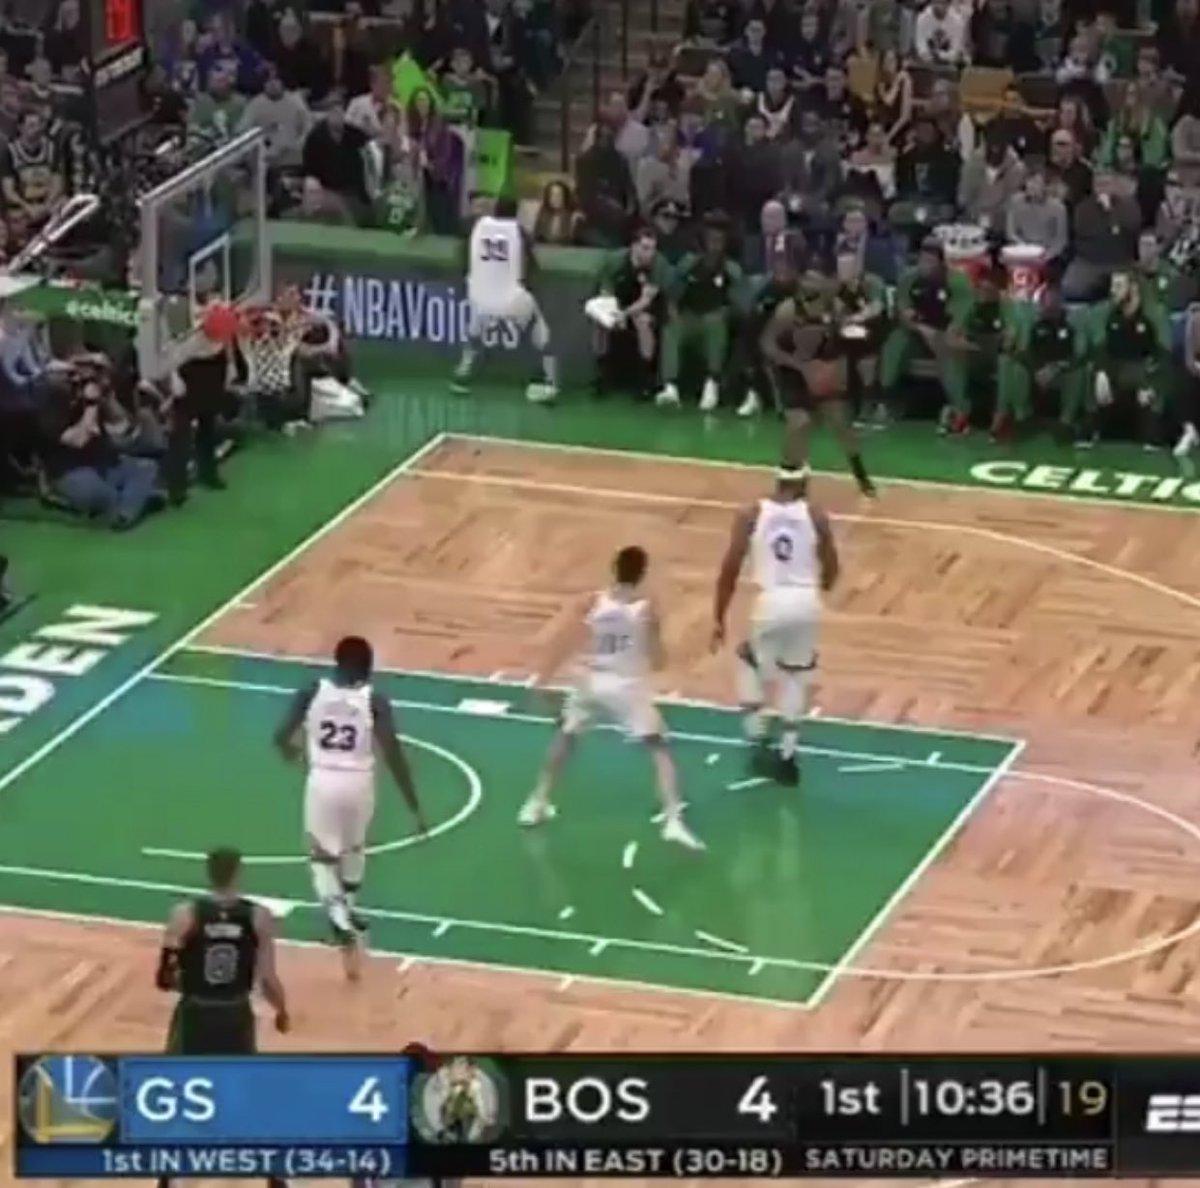 Warriors Houston Live Stream Reddit: [warriorsworld] Dumbass Wall 4 Ft From The Court, KD Tries